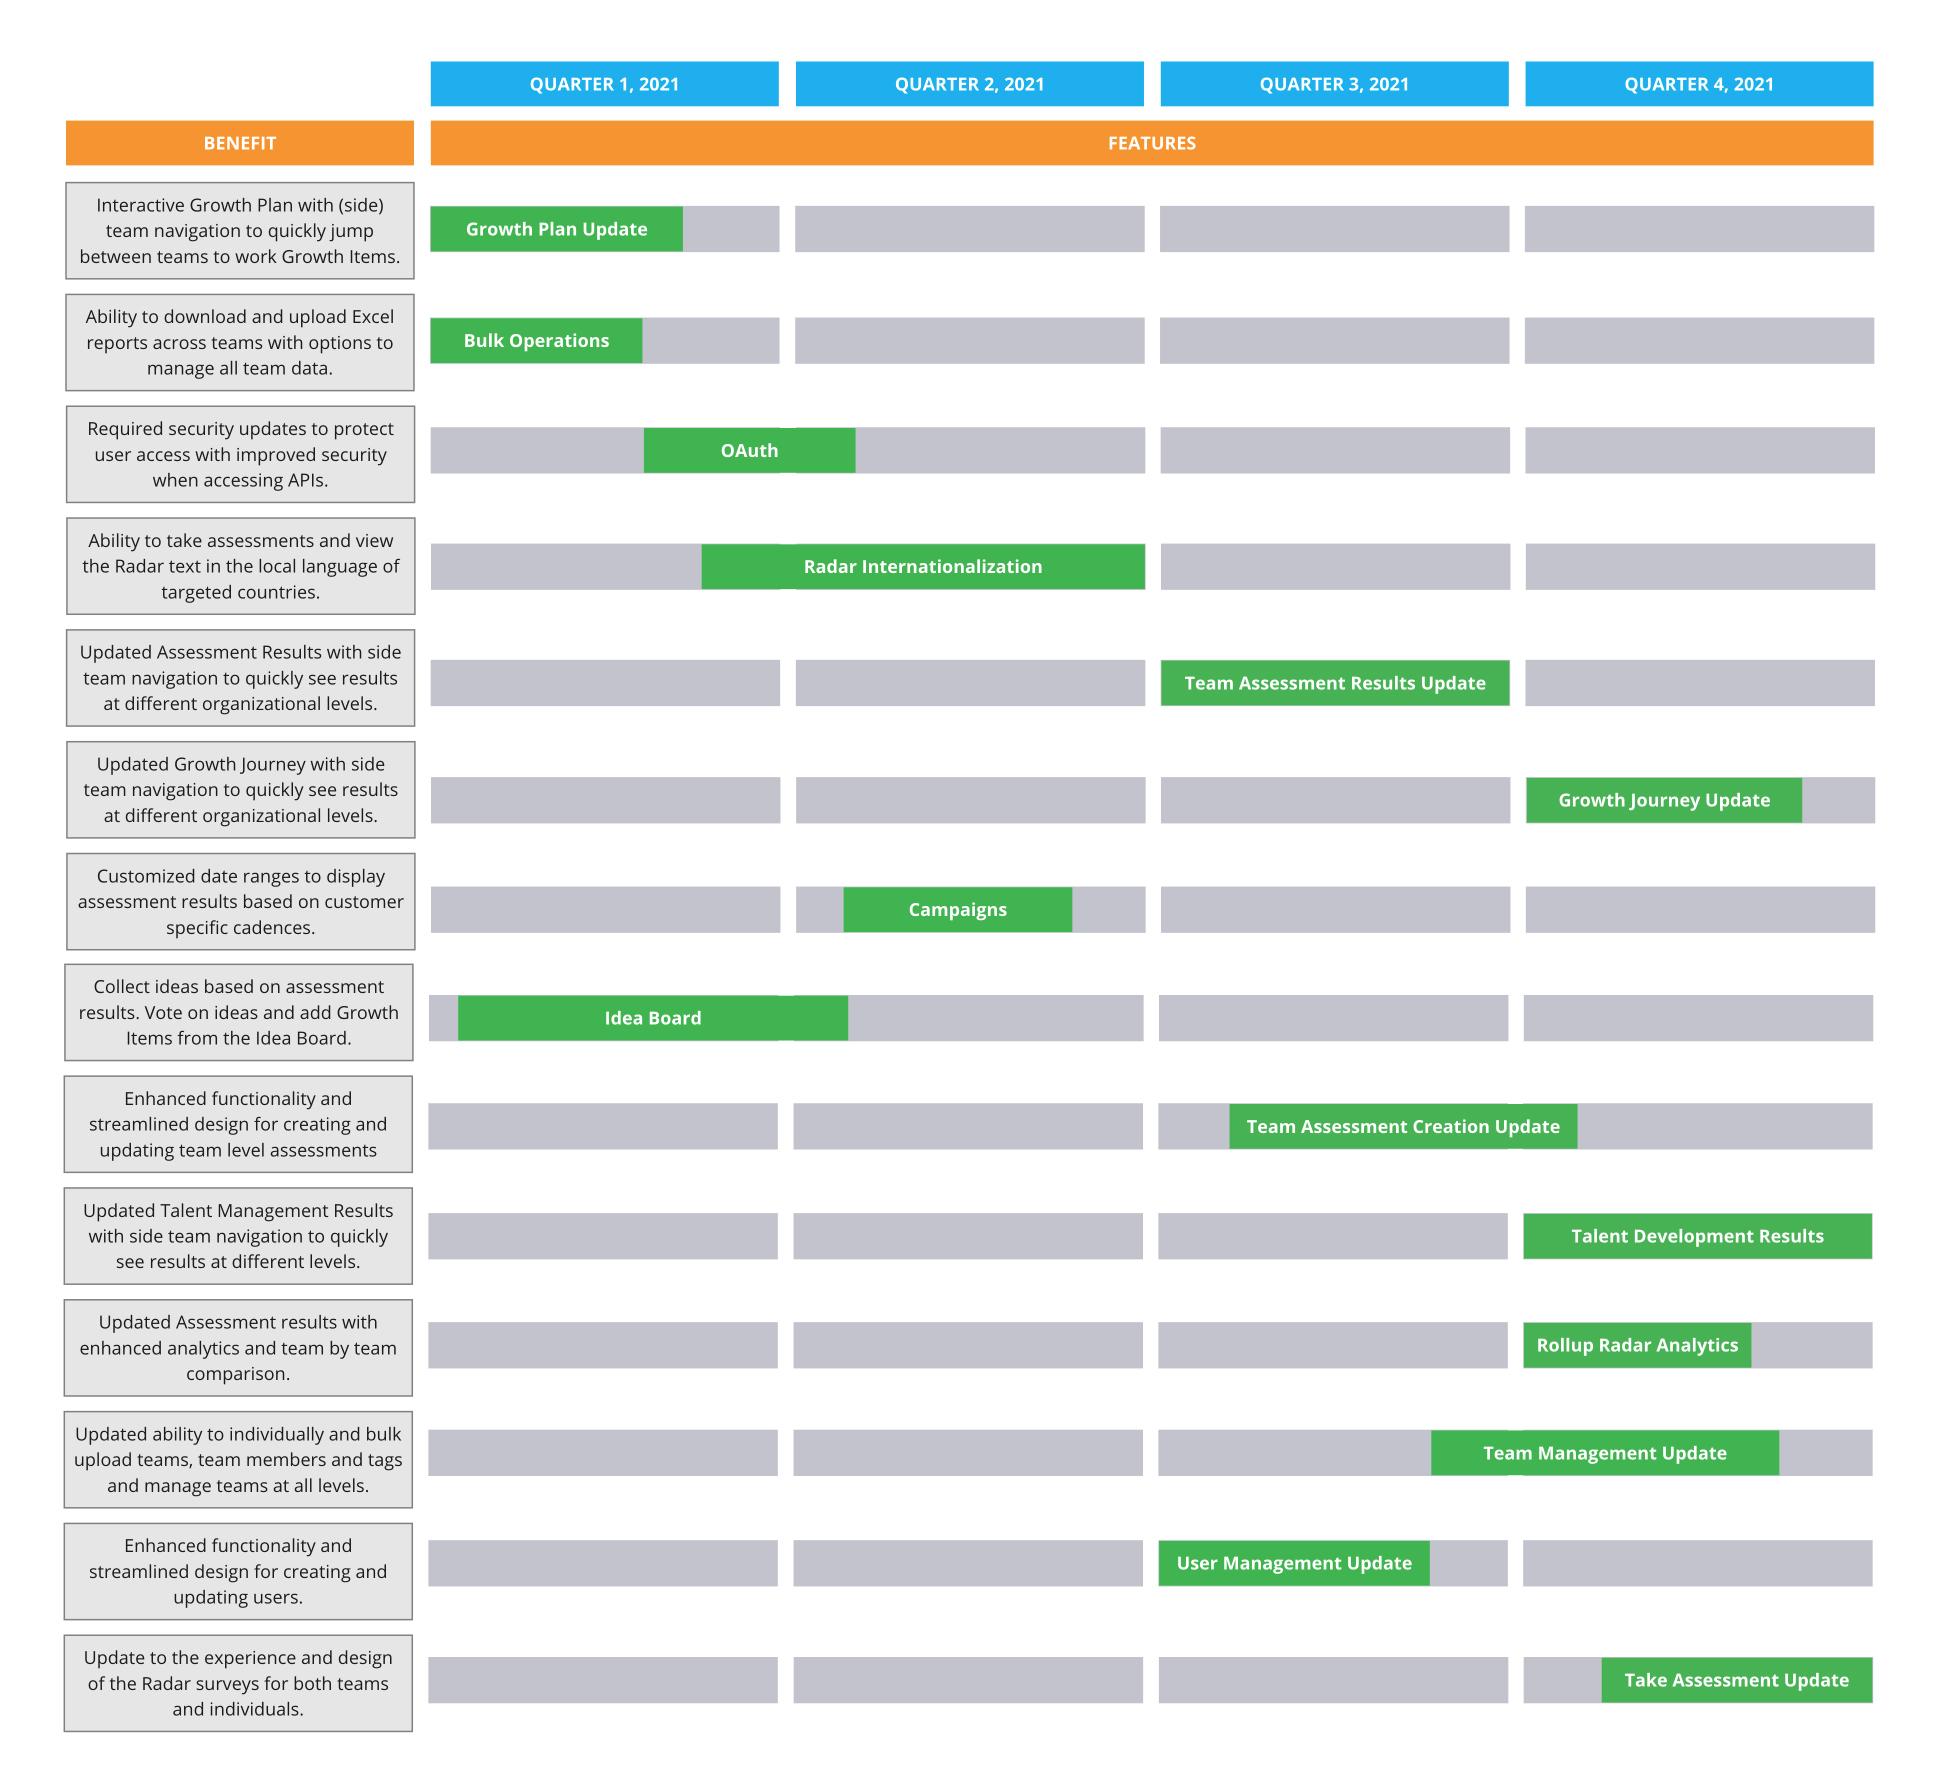 AgilityHealth 2021 Roadmap